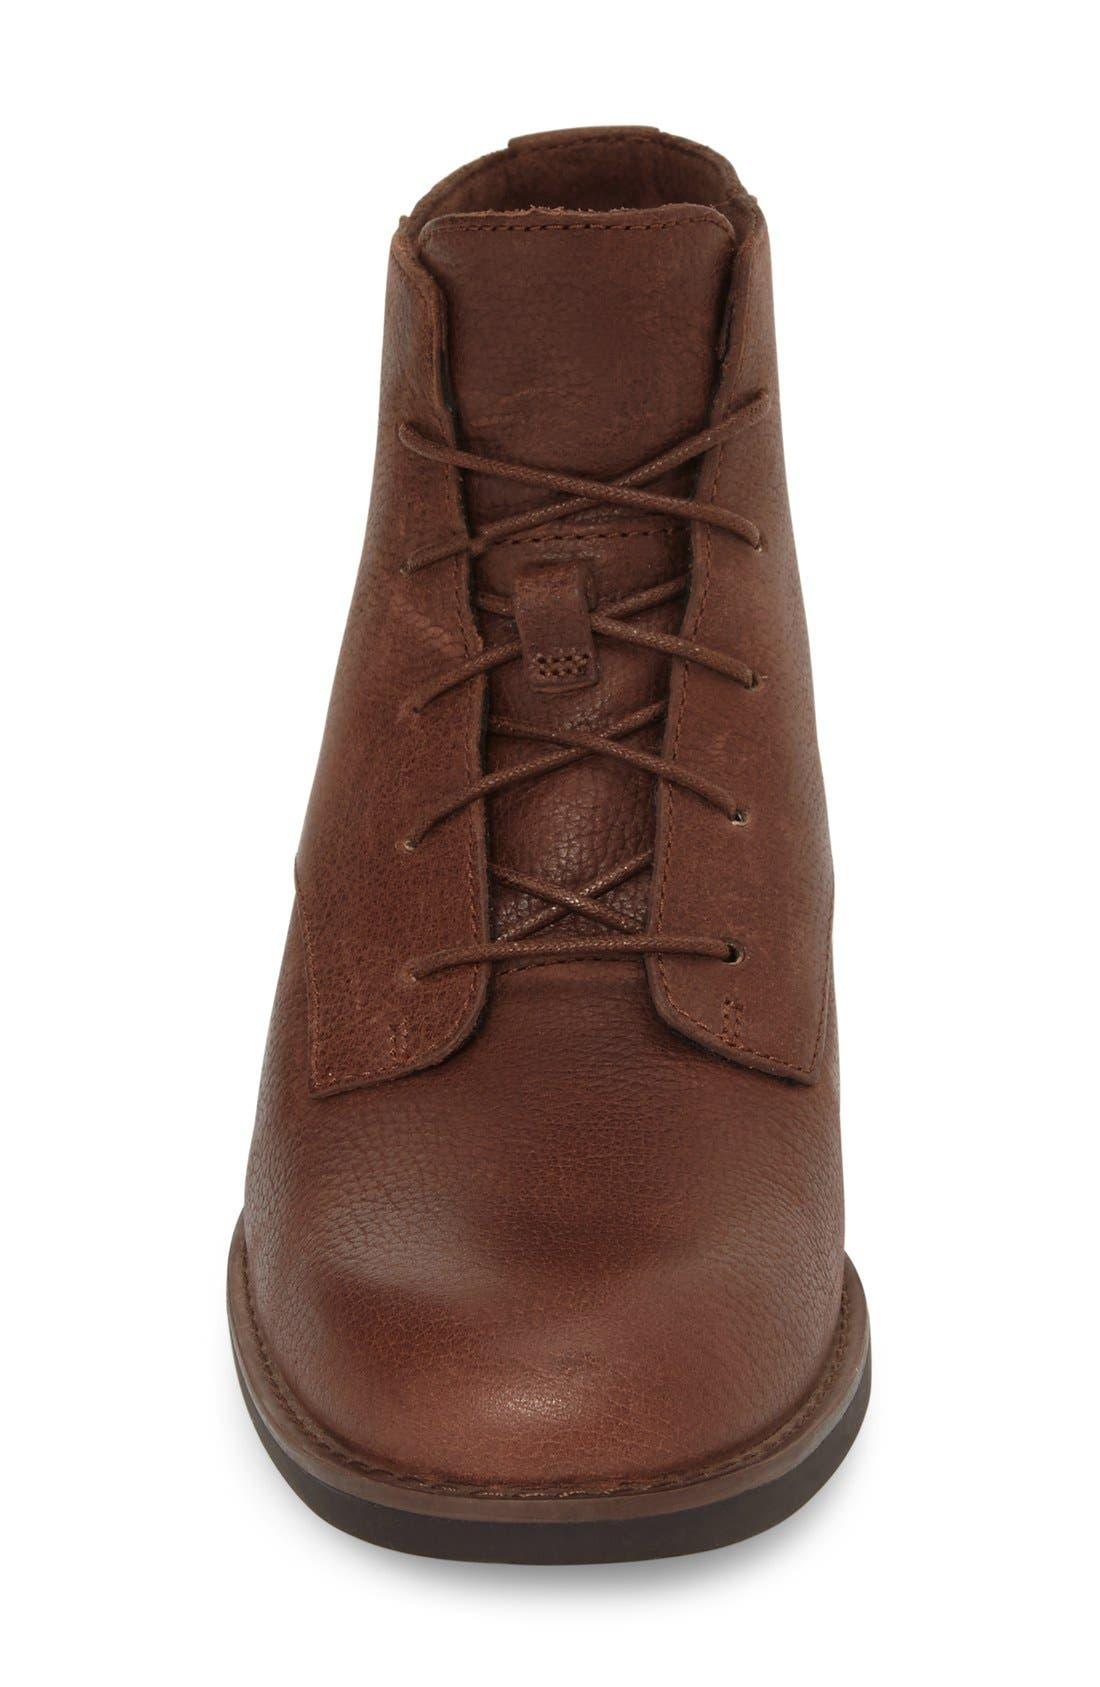 Alternate Image 3  - Timberland 'Beckwith' Lace-Up Chukka Boot (Women)